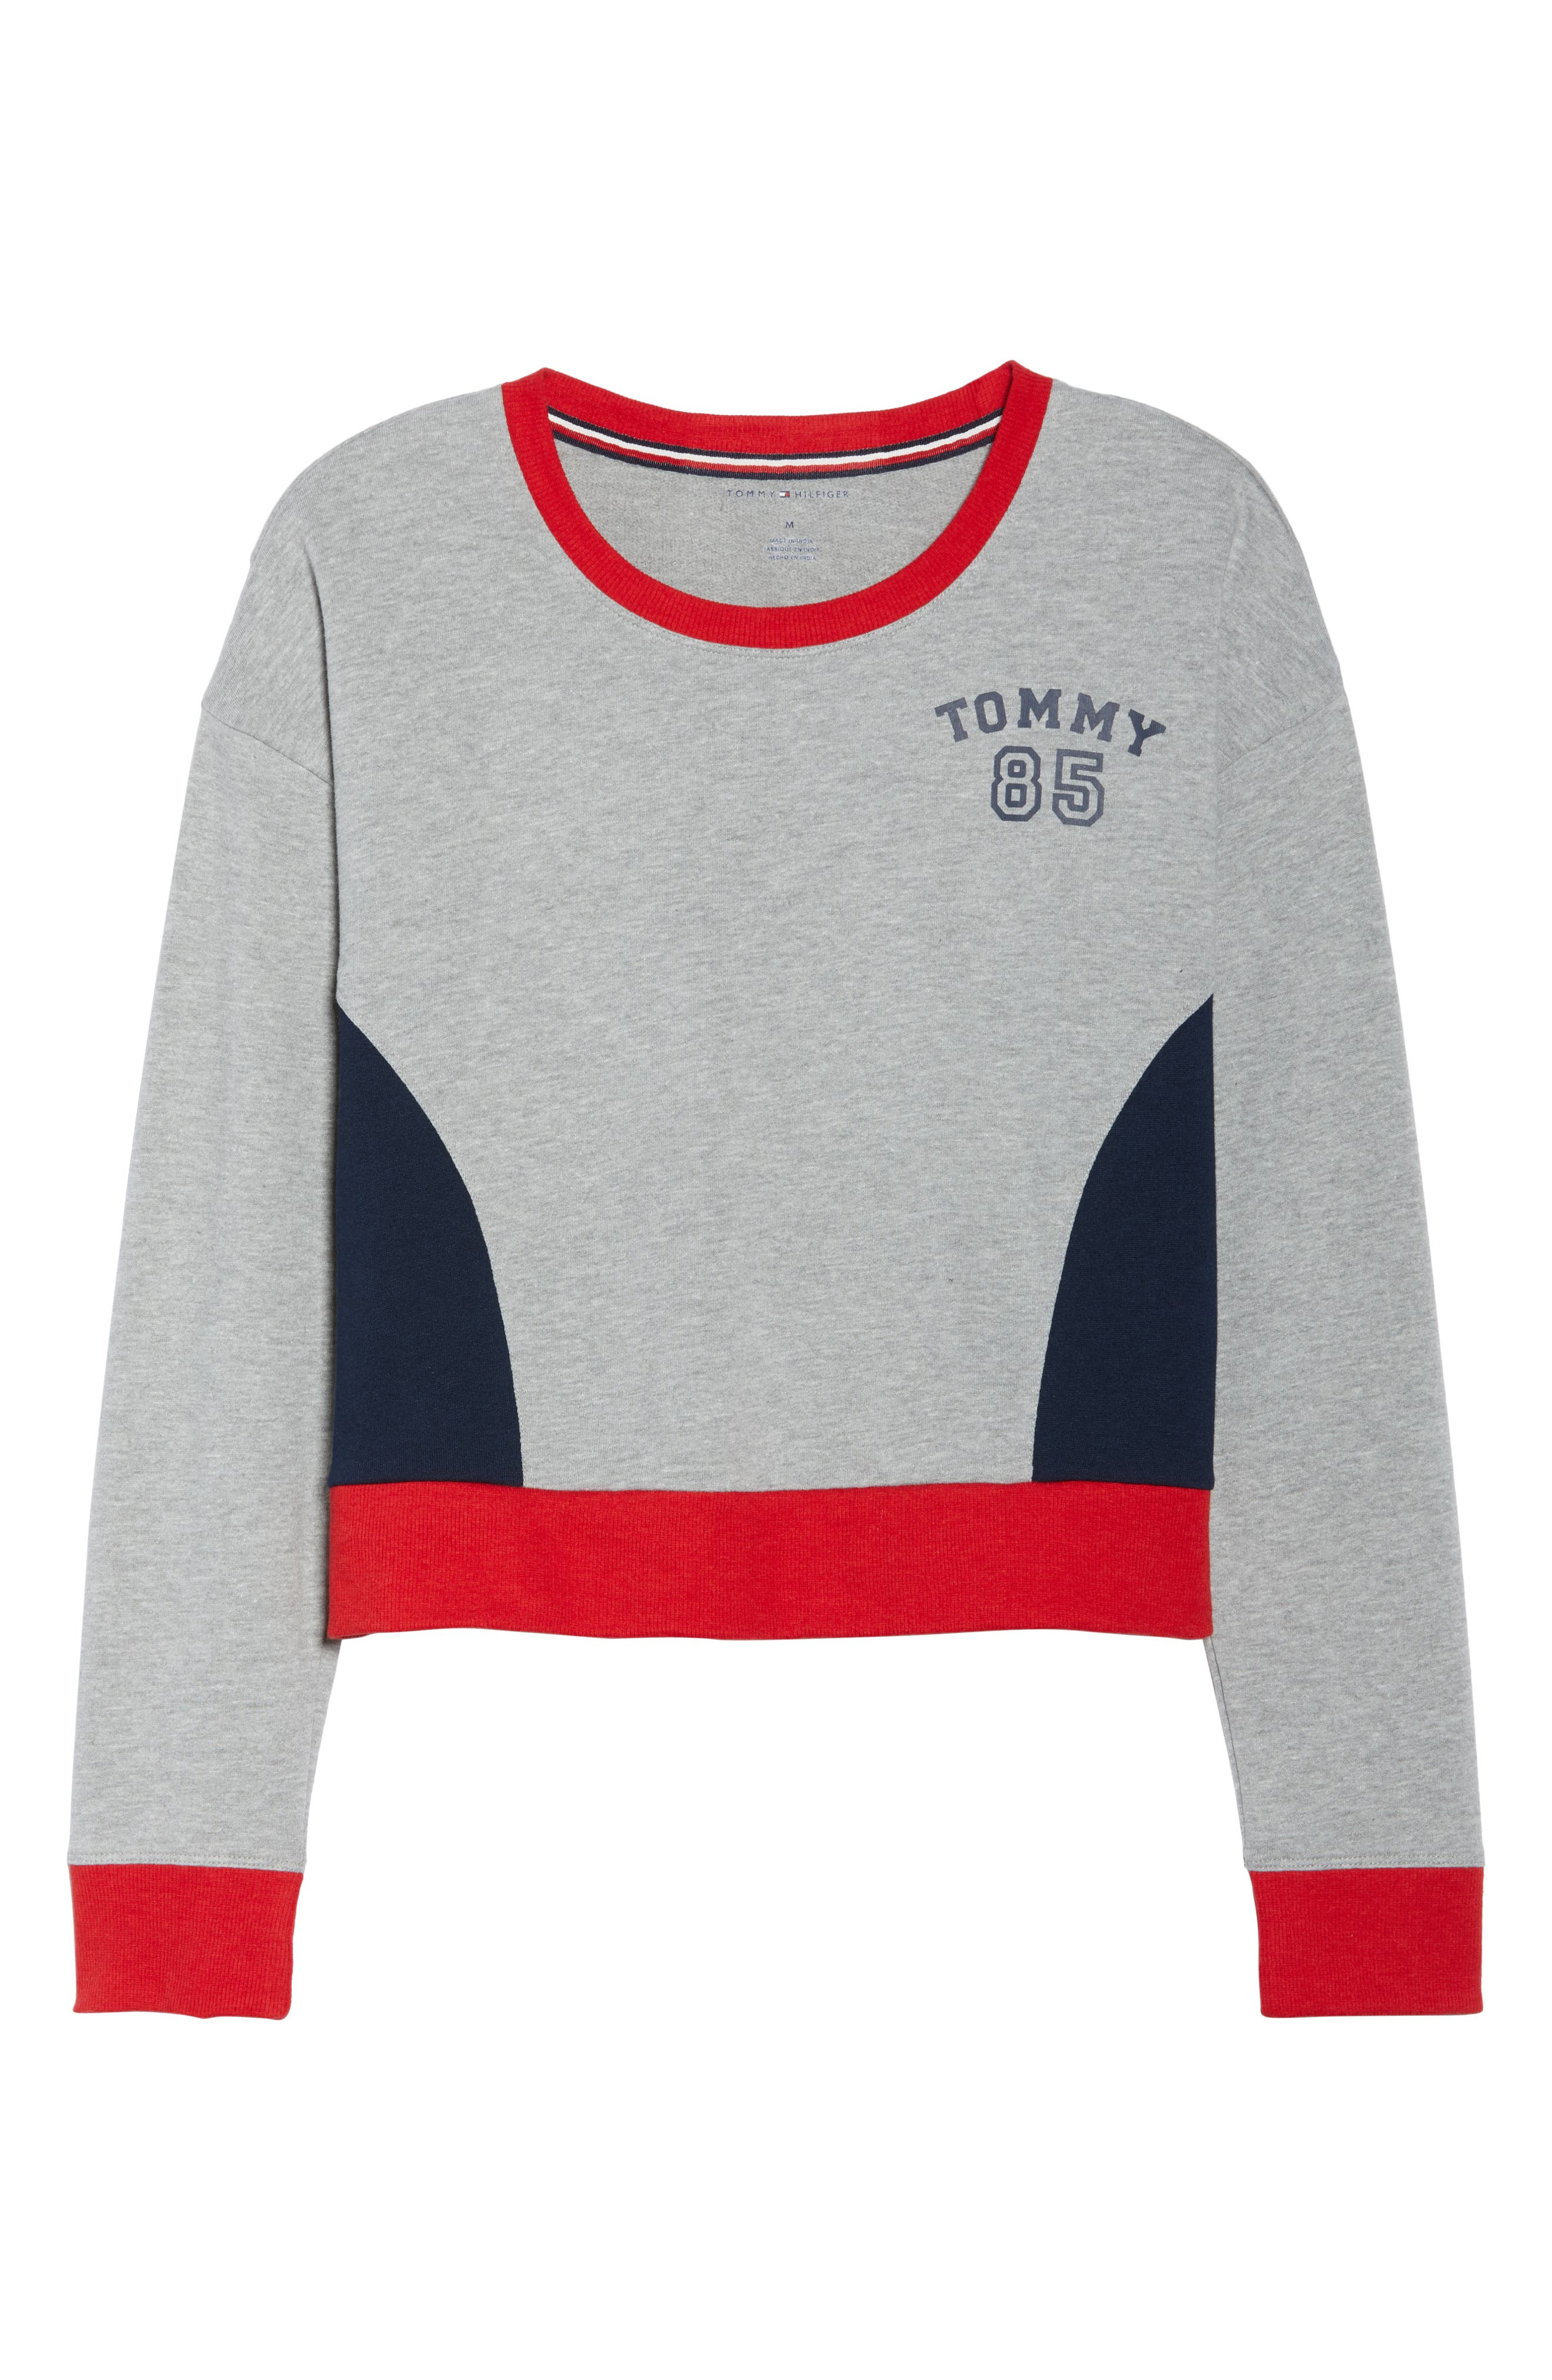 Crop Lounge Sweatshirt,                             Alternate thumbnail 7, color,                             Heather Gray